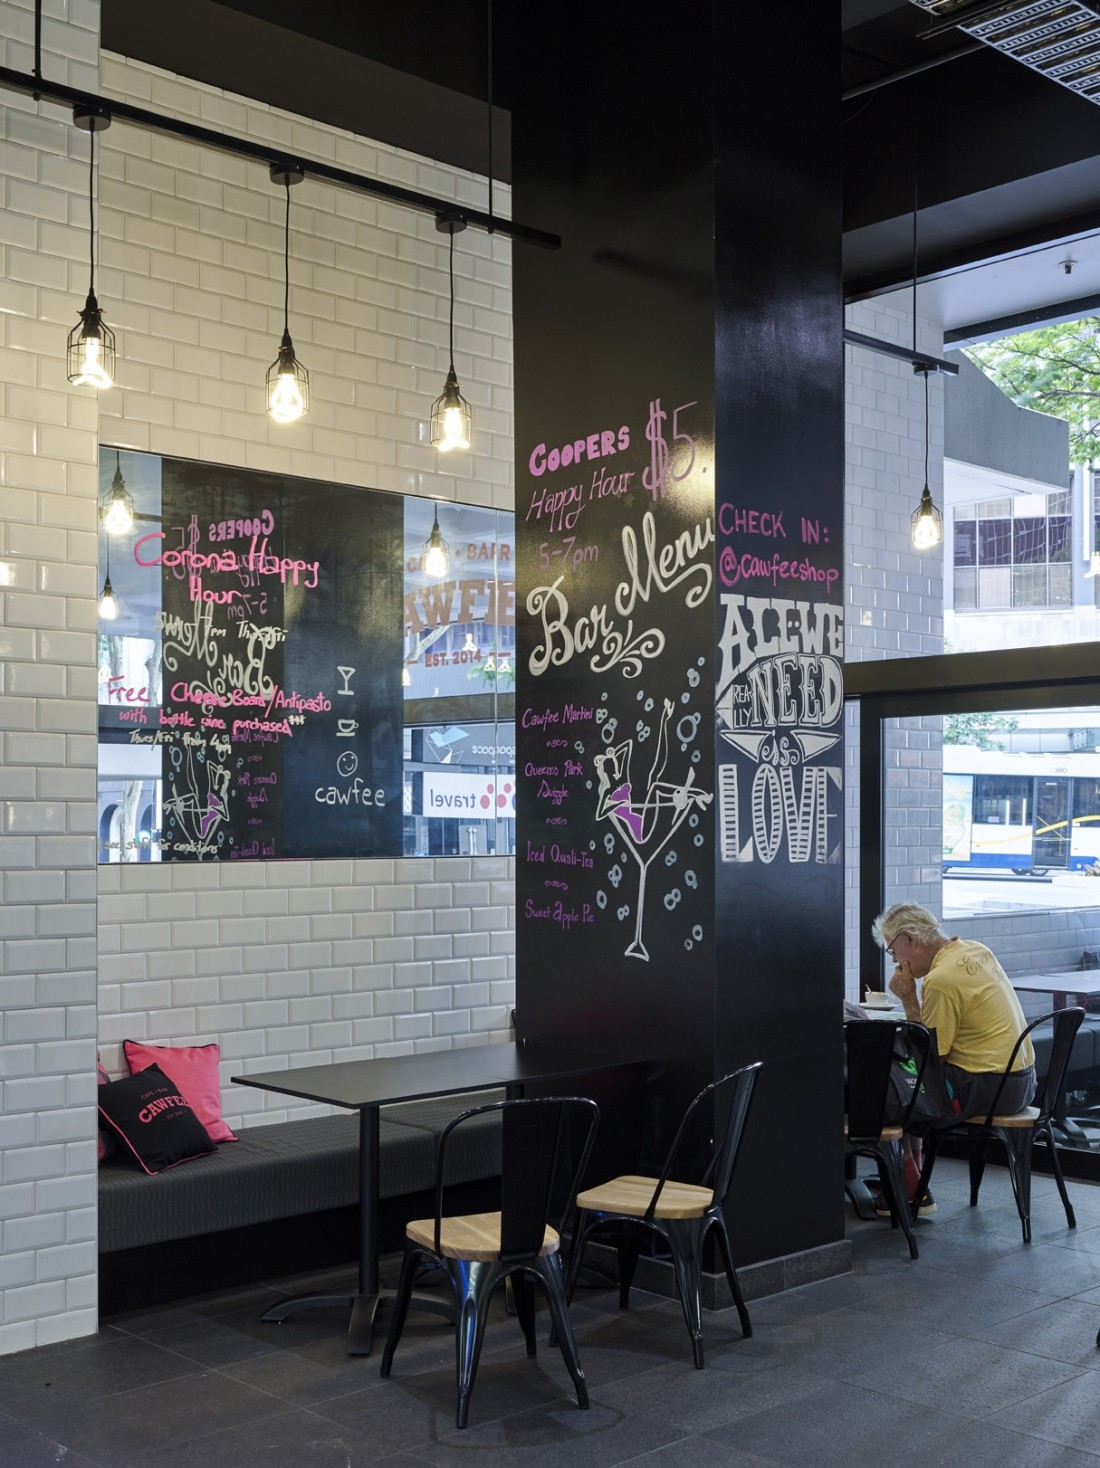 Cawfee - Reddog Architects Award Winning Architects Brisbane